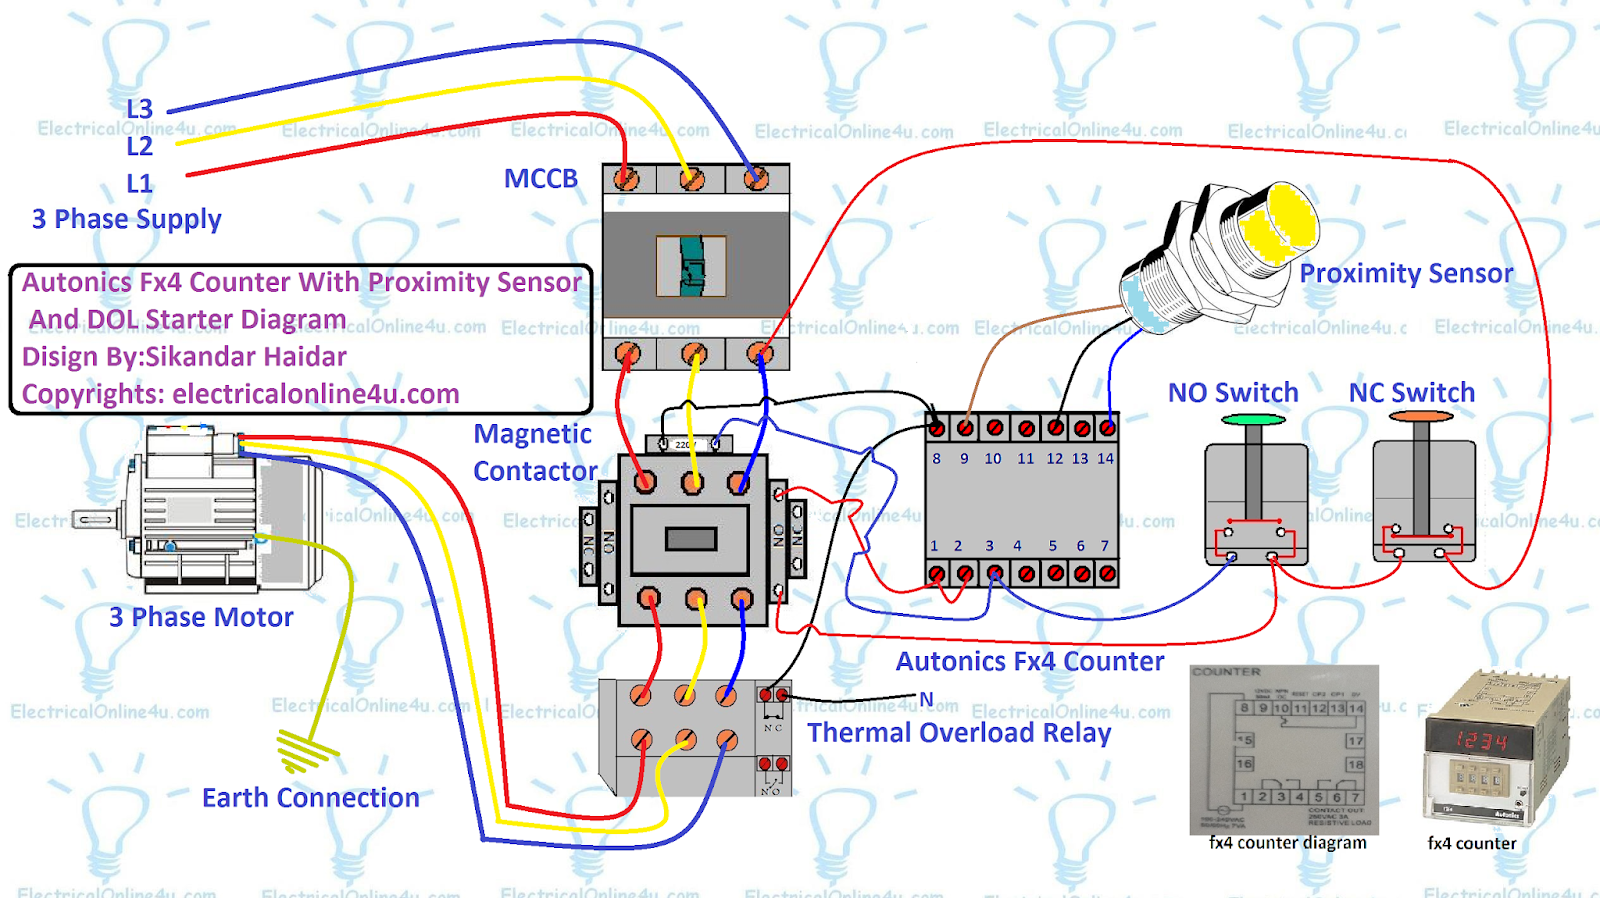 medium resolution of autonics fx4 counter with dol starter and proximity sensor diagram